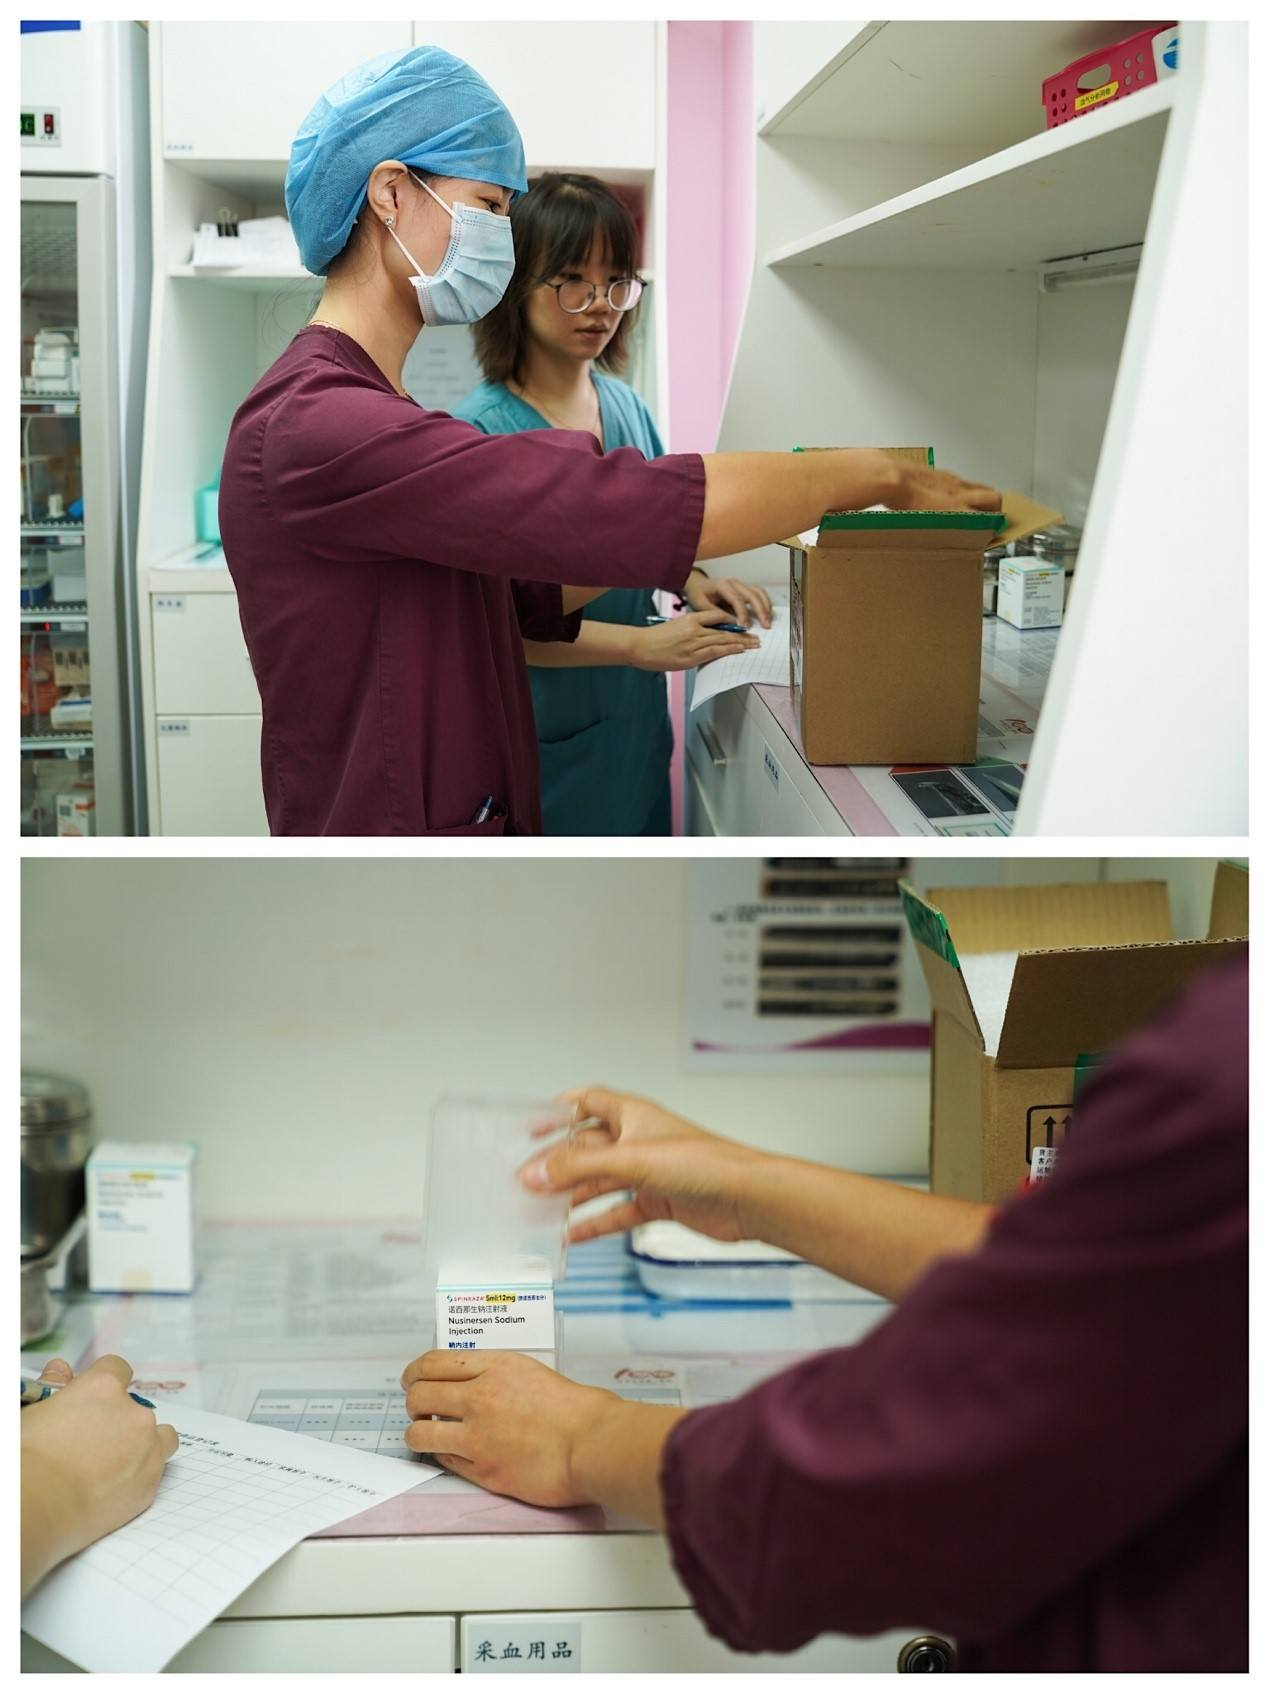 http://www.store4car.com/jiankang/1074509.html